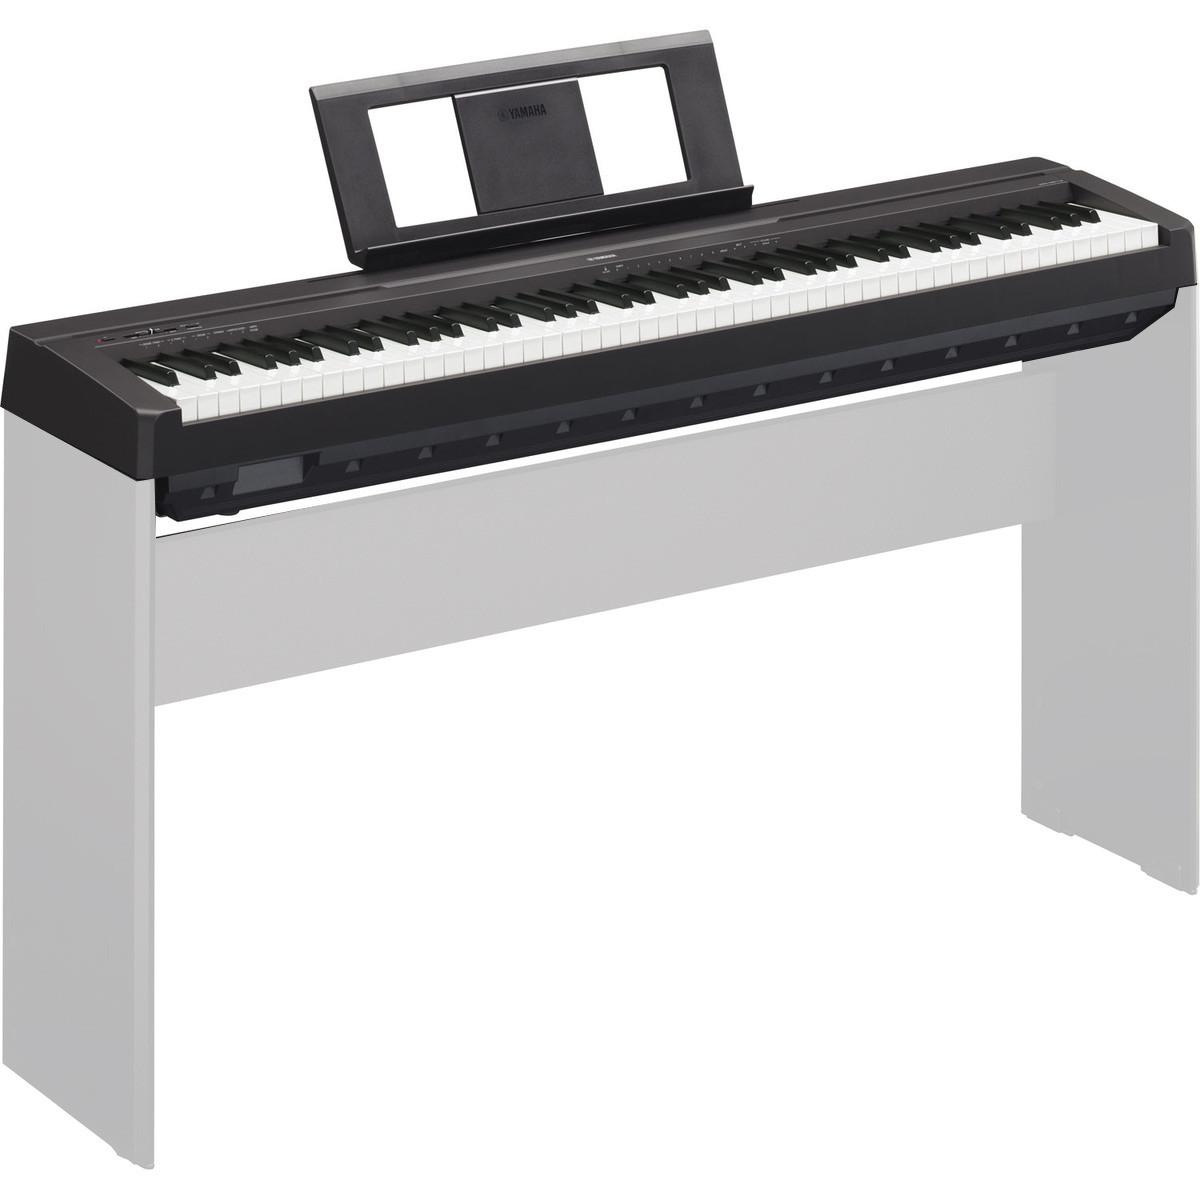 yamaha p45 digital piano black ex demo at. Black Bedroom Furniture Sets. Home Design Ideas